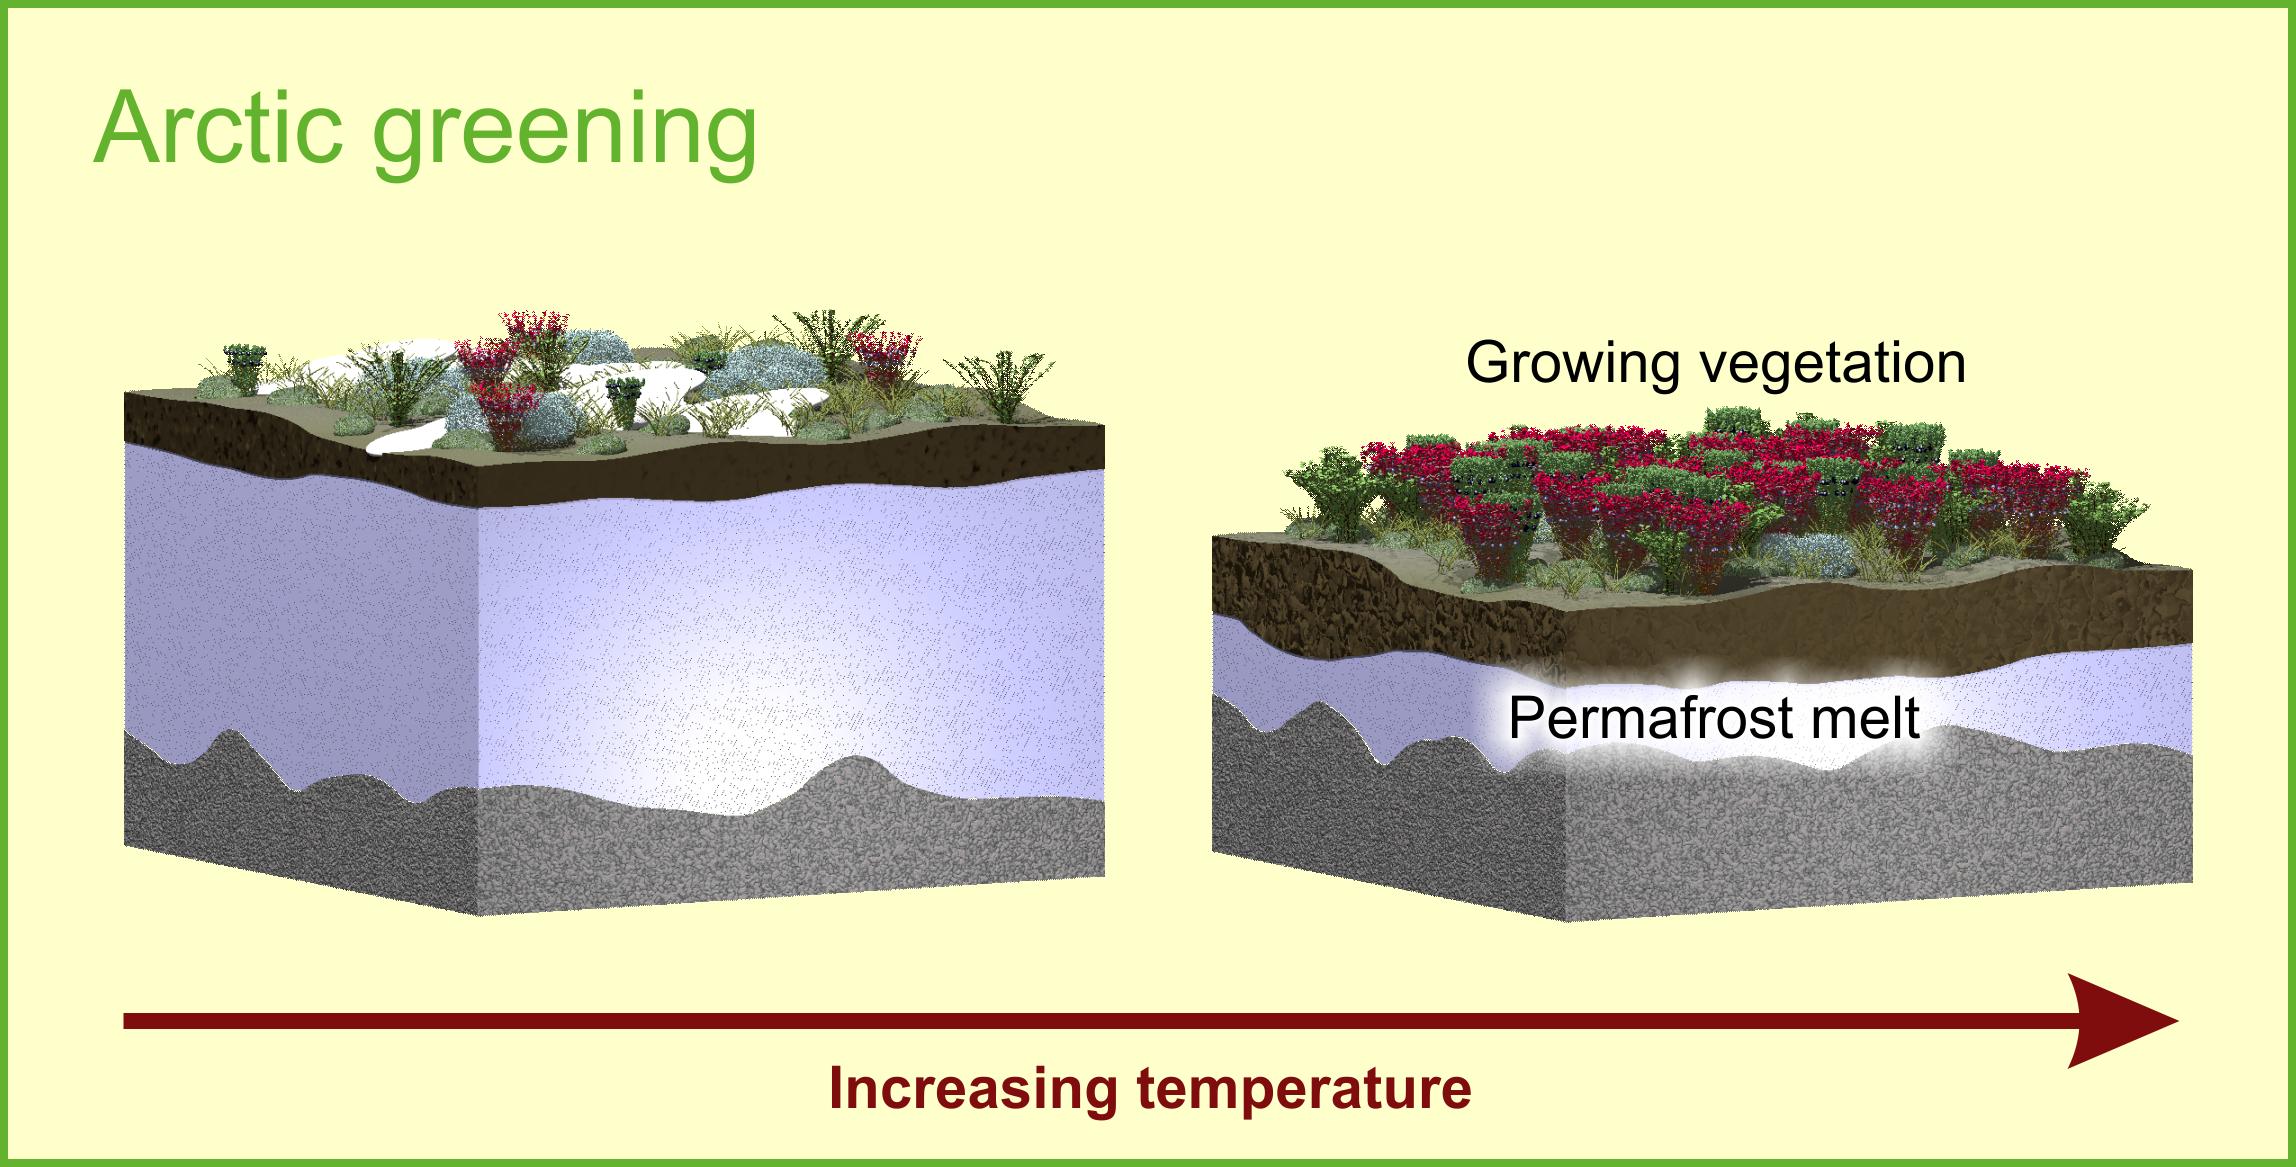 Arctic greening